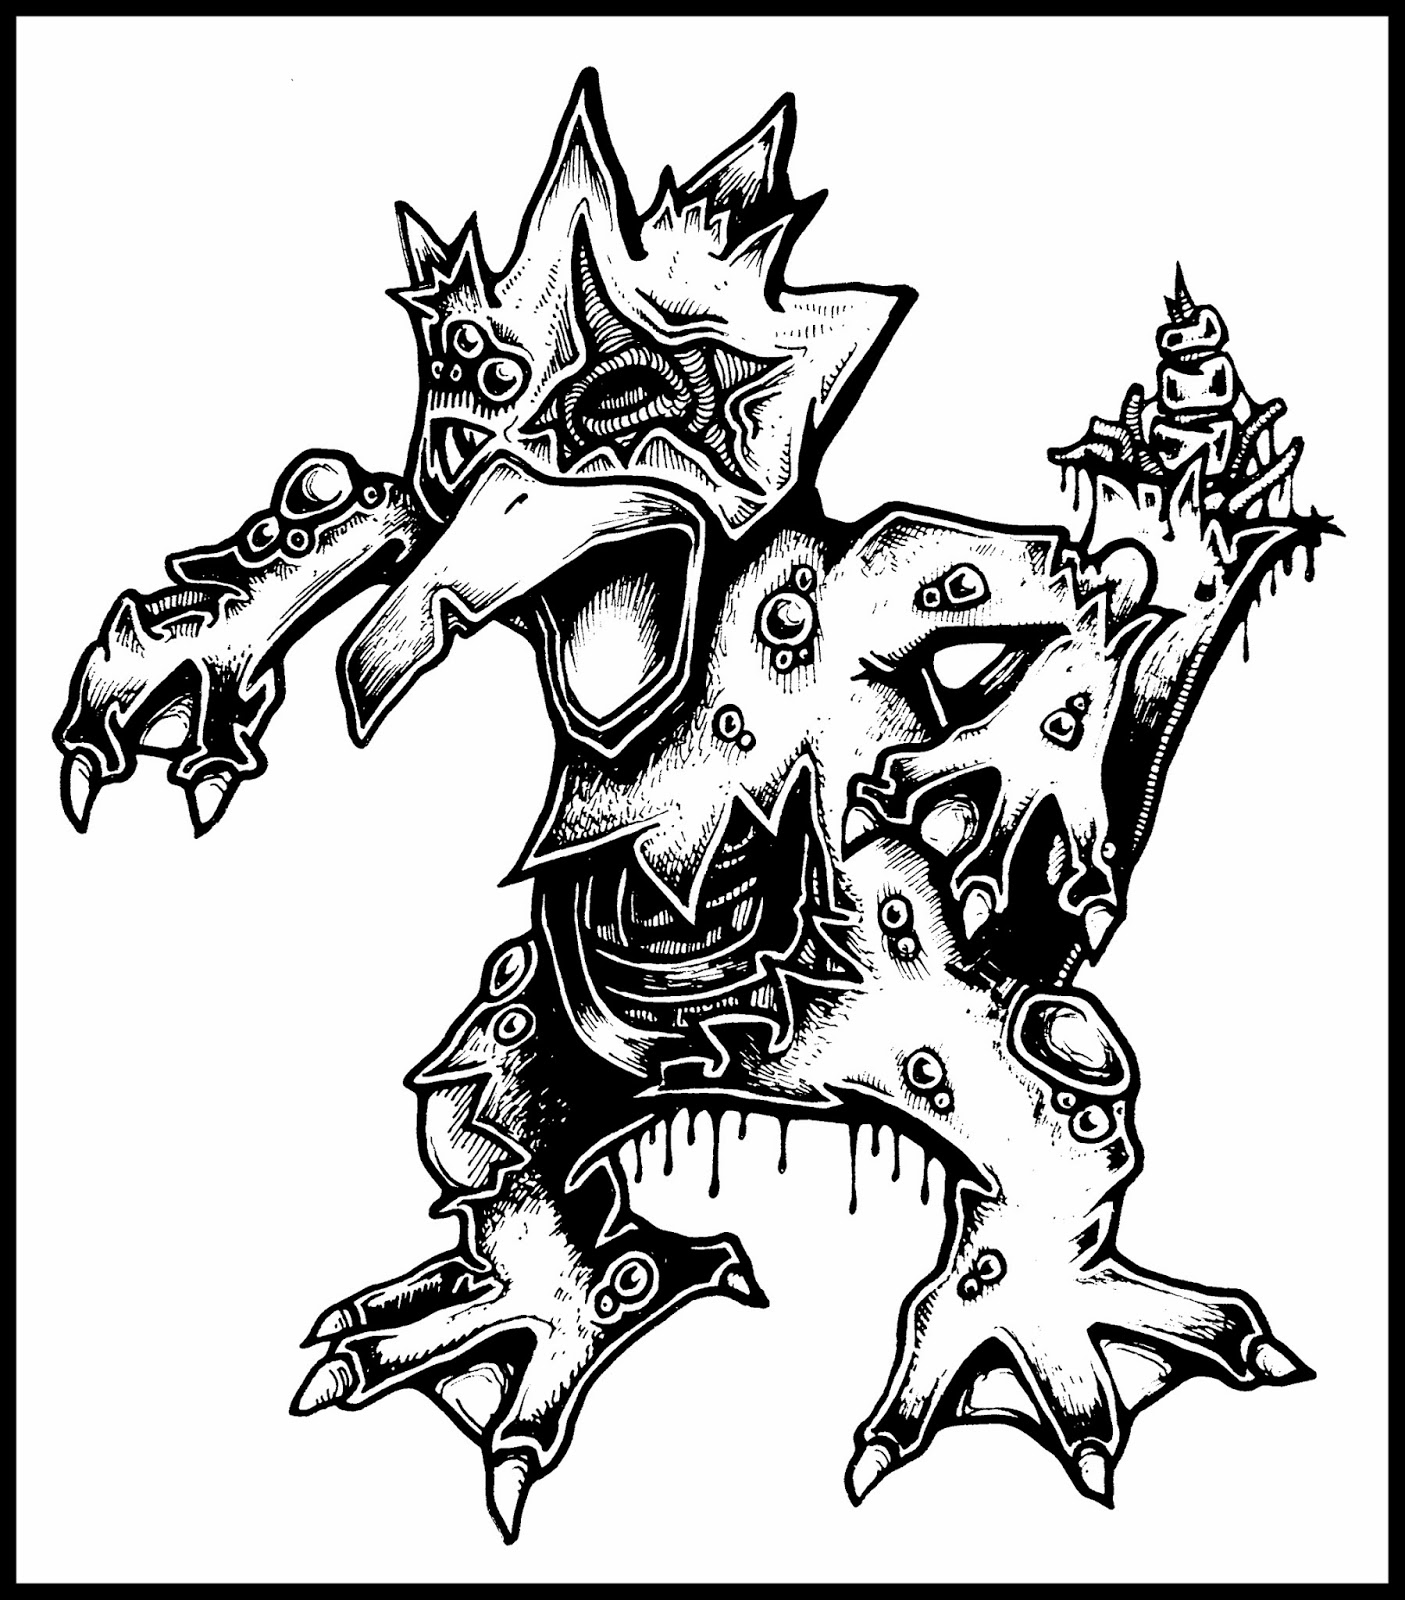 New Zombie Pokemon Daryl Hobson Artwork